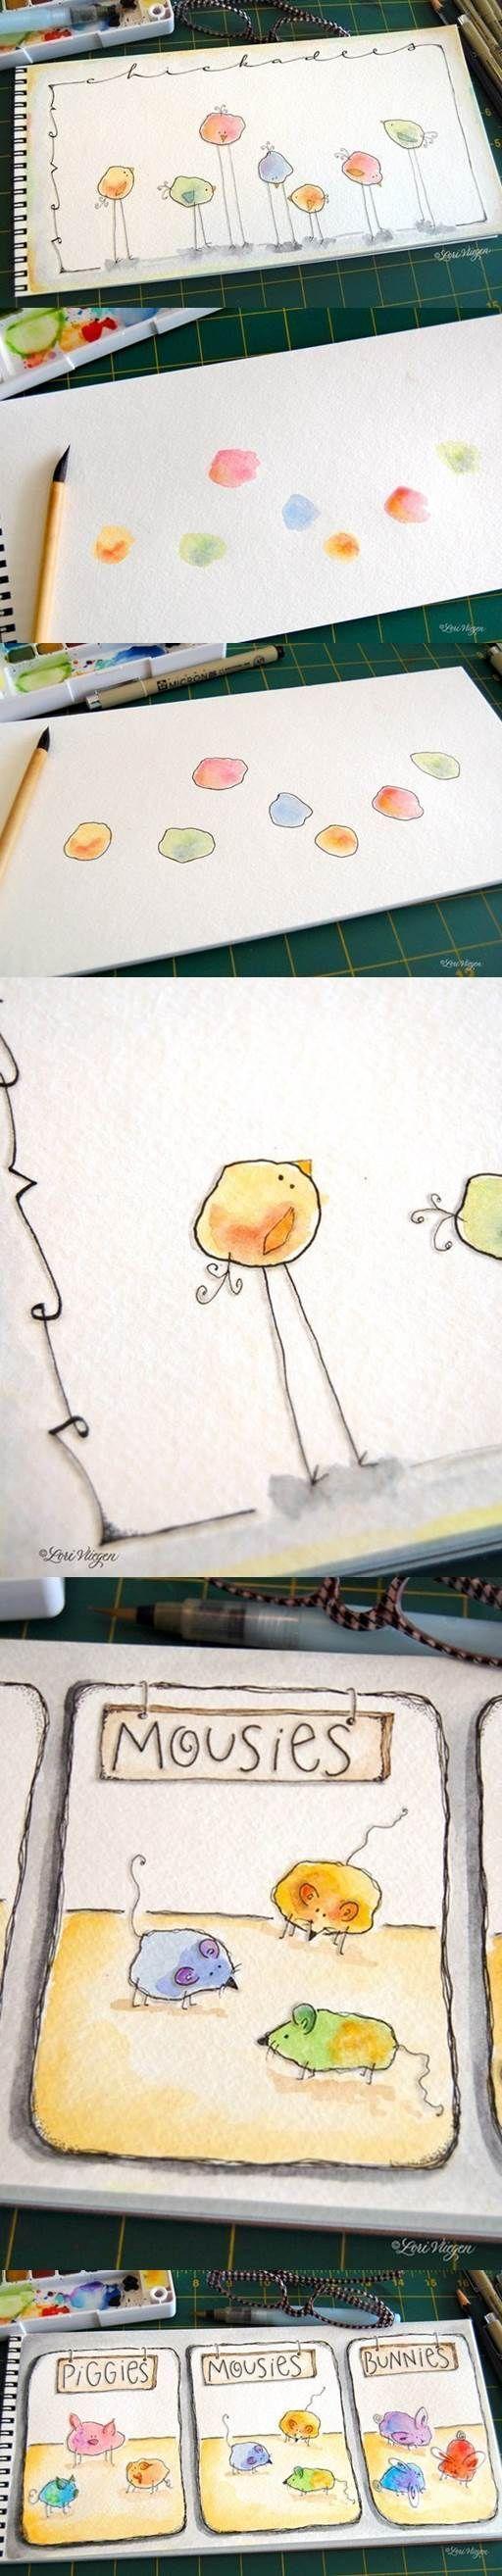 Creative Ways to Draw Funny Birds | LIKE Us on Facebook ==> www.facebook.com/...